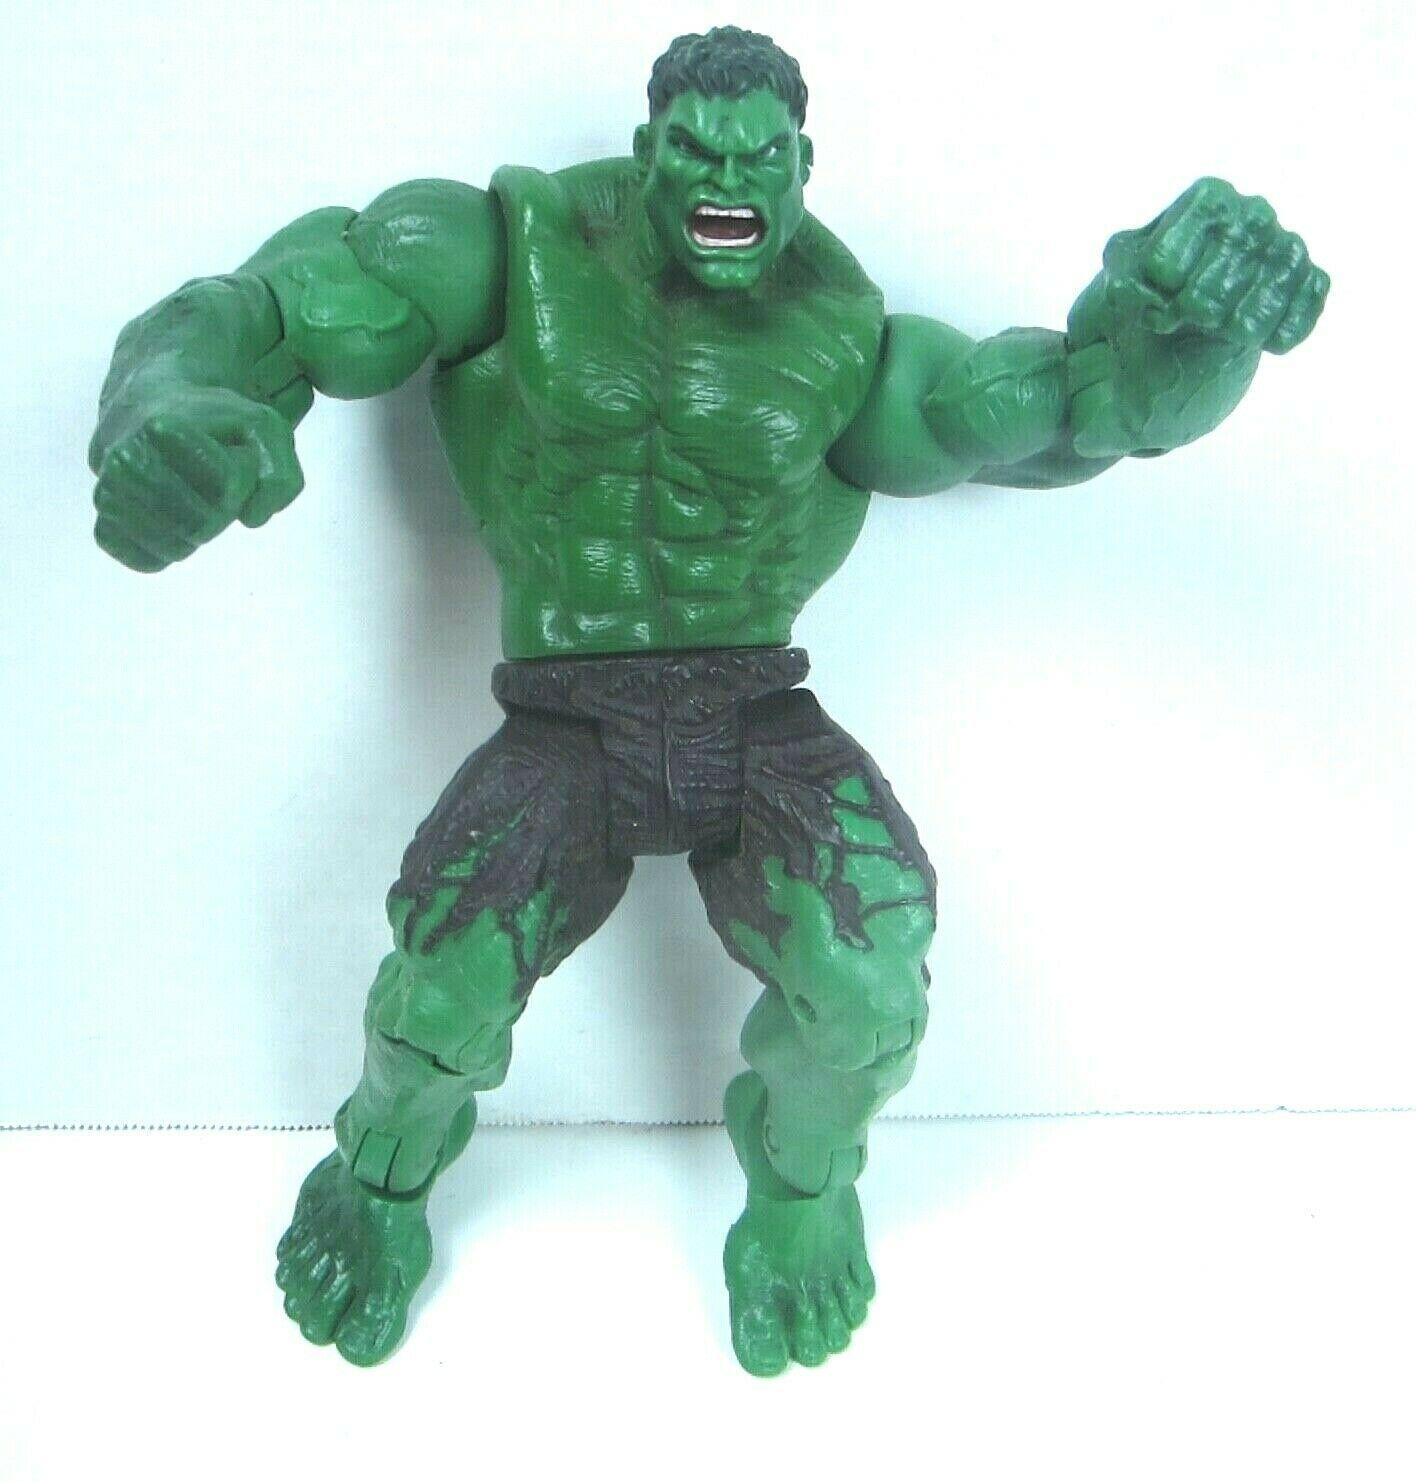 "2003 Hulk the Movie Action Figure Universal Marvel Throwing Smash Arms 8"""